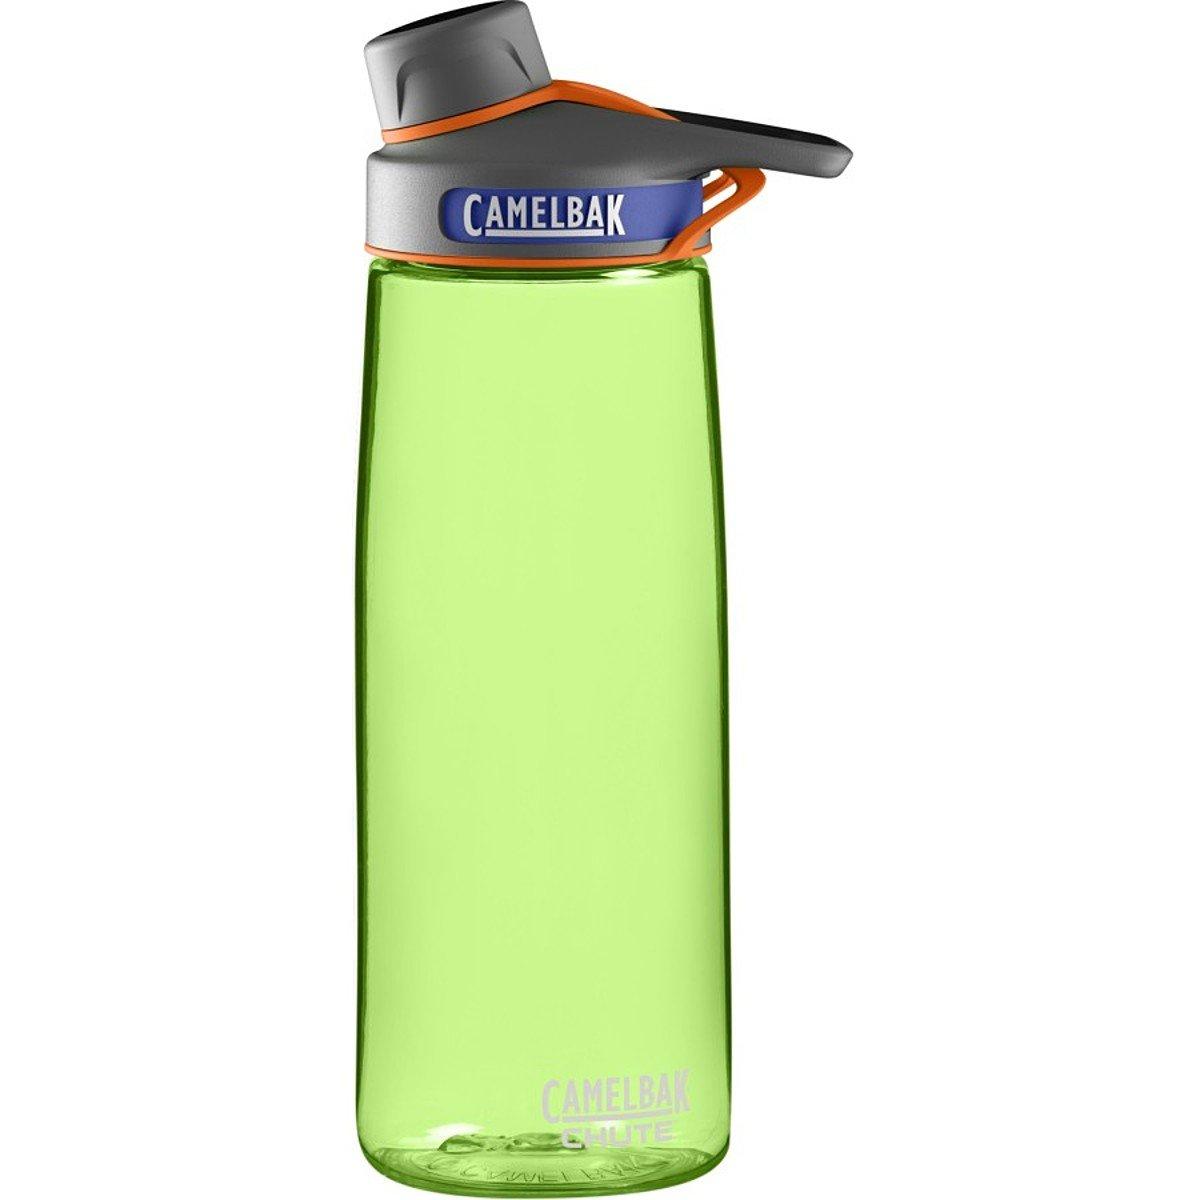 Camelbak Water Bottle Chute Amazon com  CamelBak Chute